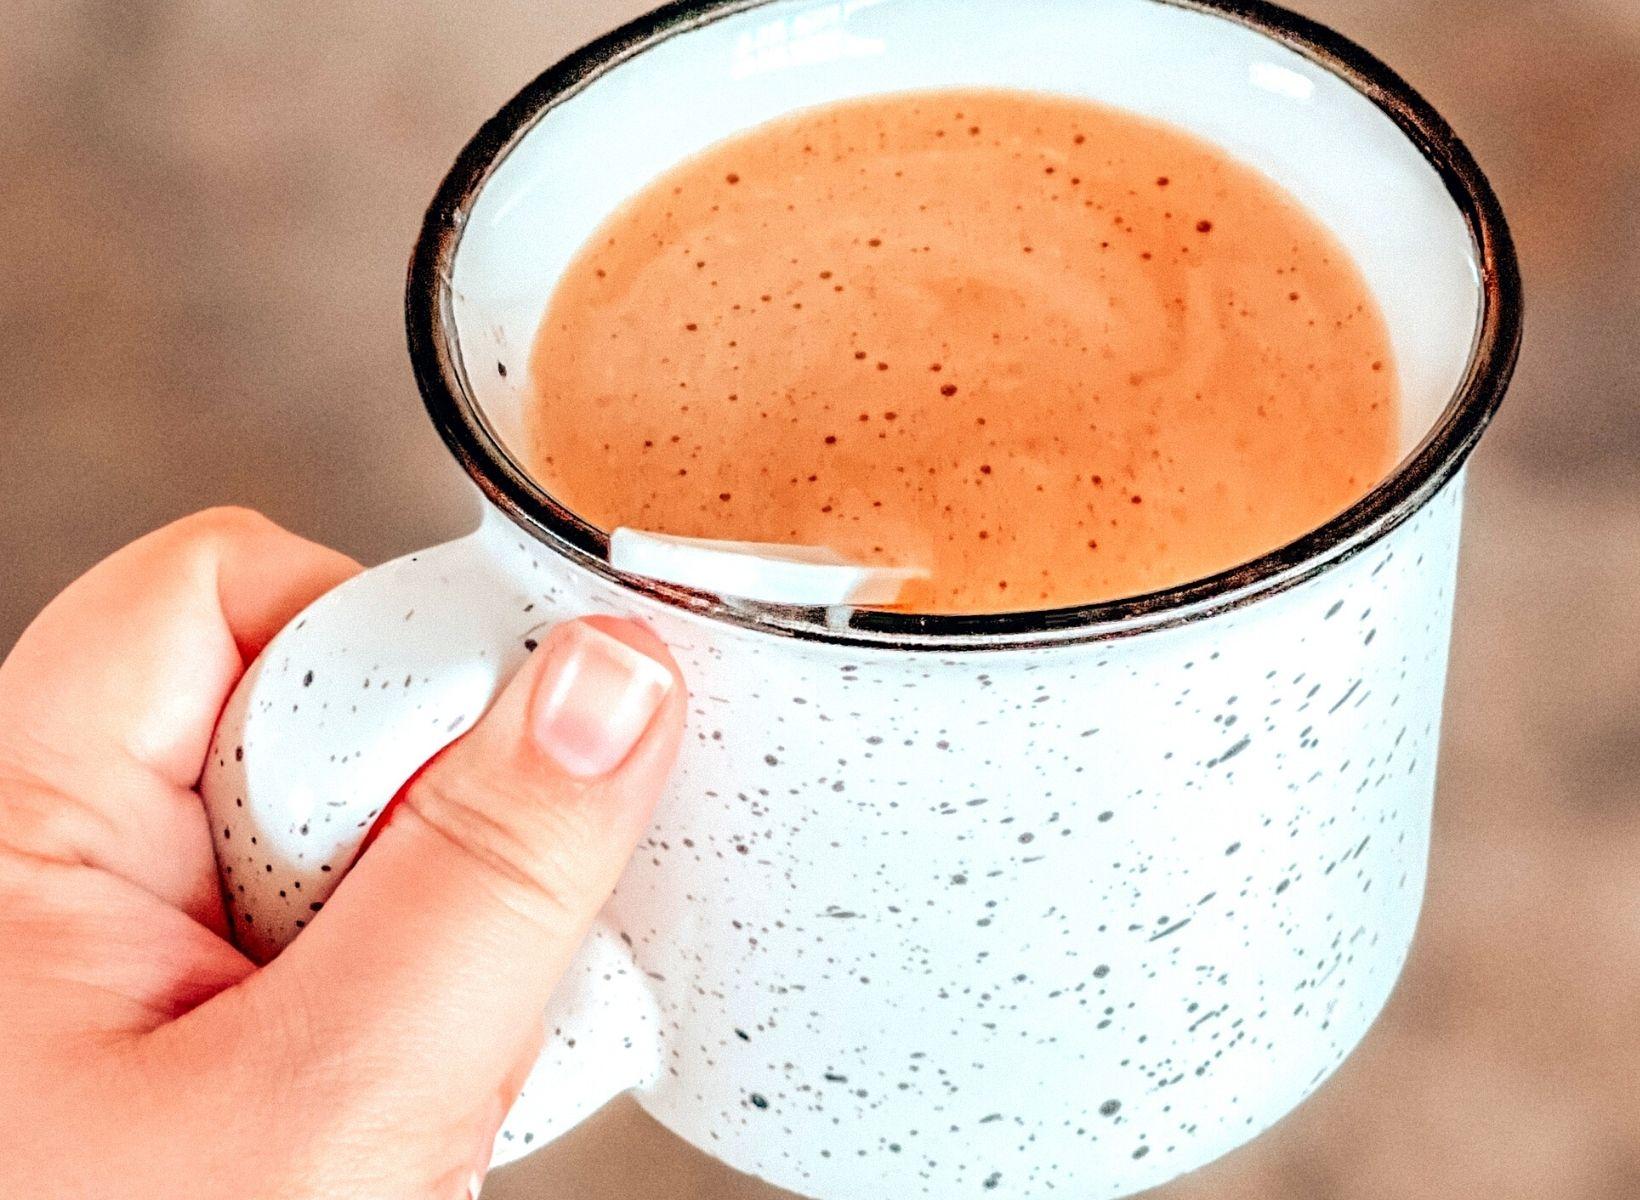 A closeup shot of a hand holding a white mug with keto coffee inside